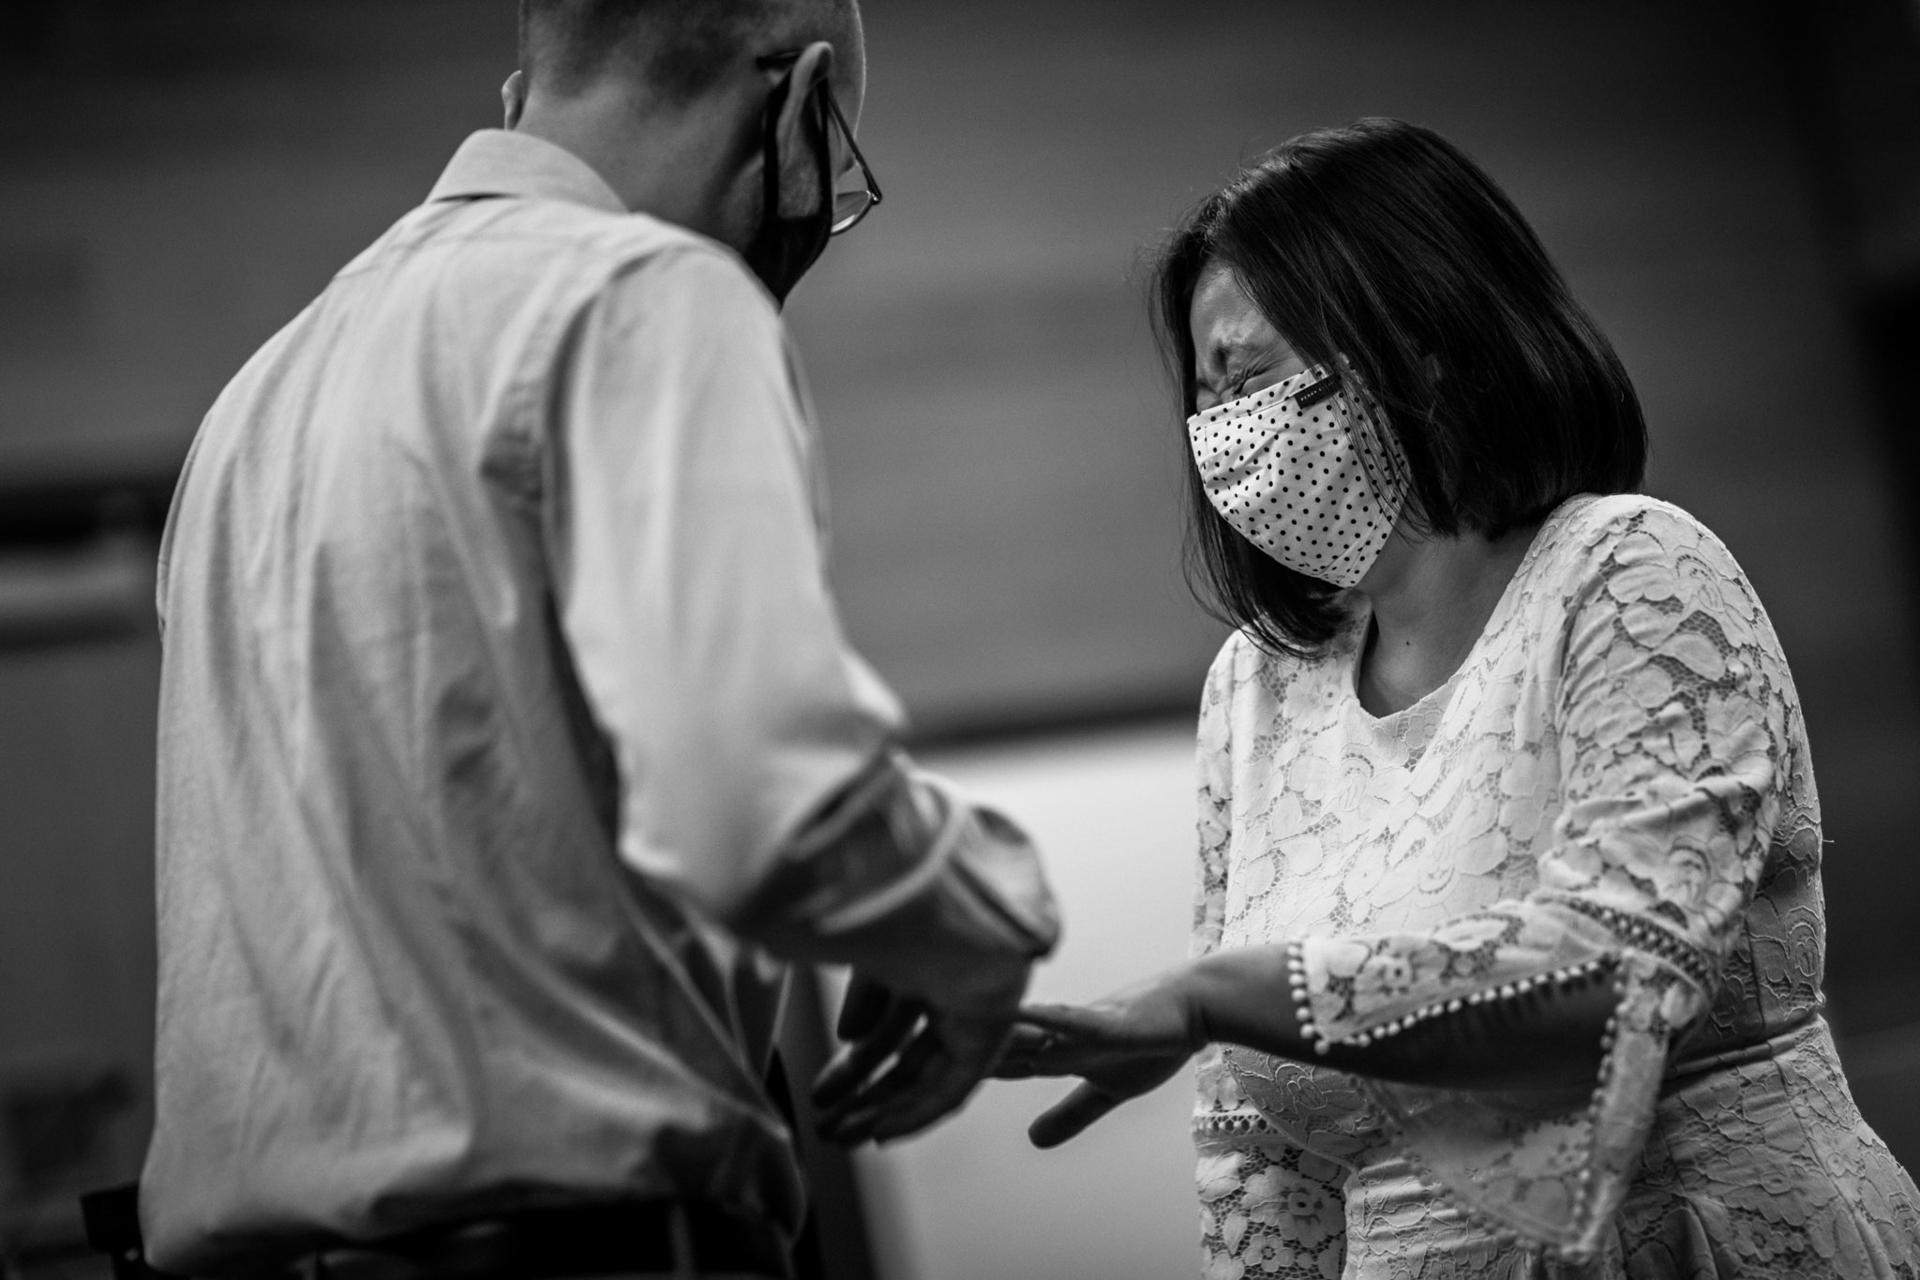 Fotografía de la boda de Minnesota Courthouse | Durante la ceremonia, la novia se ríe mientras el novio se inquieta.